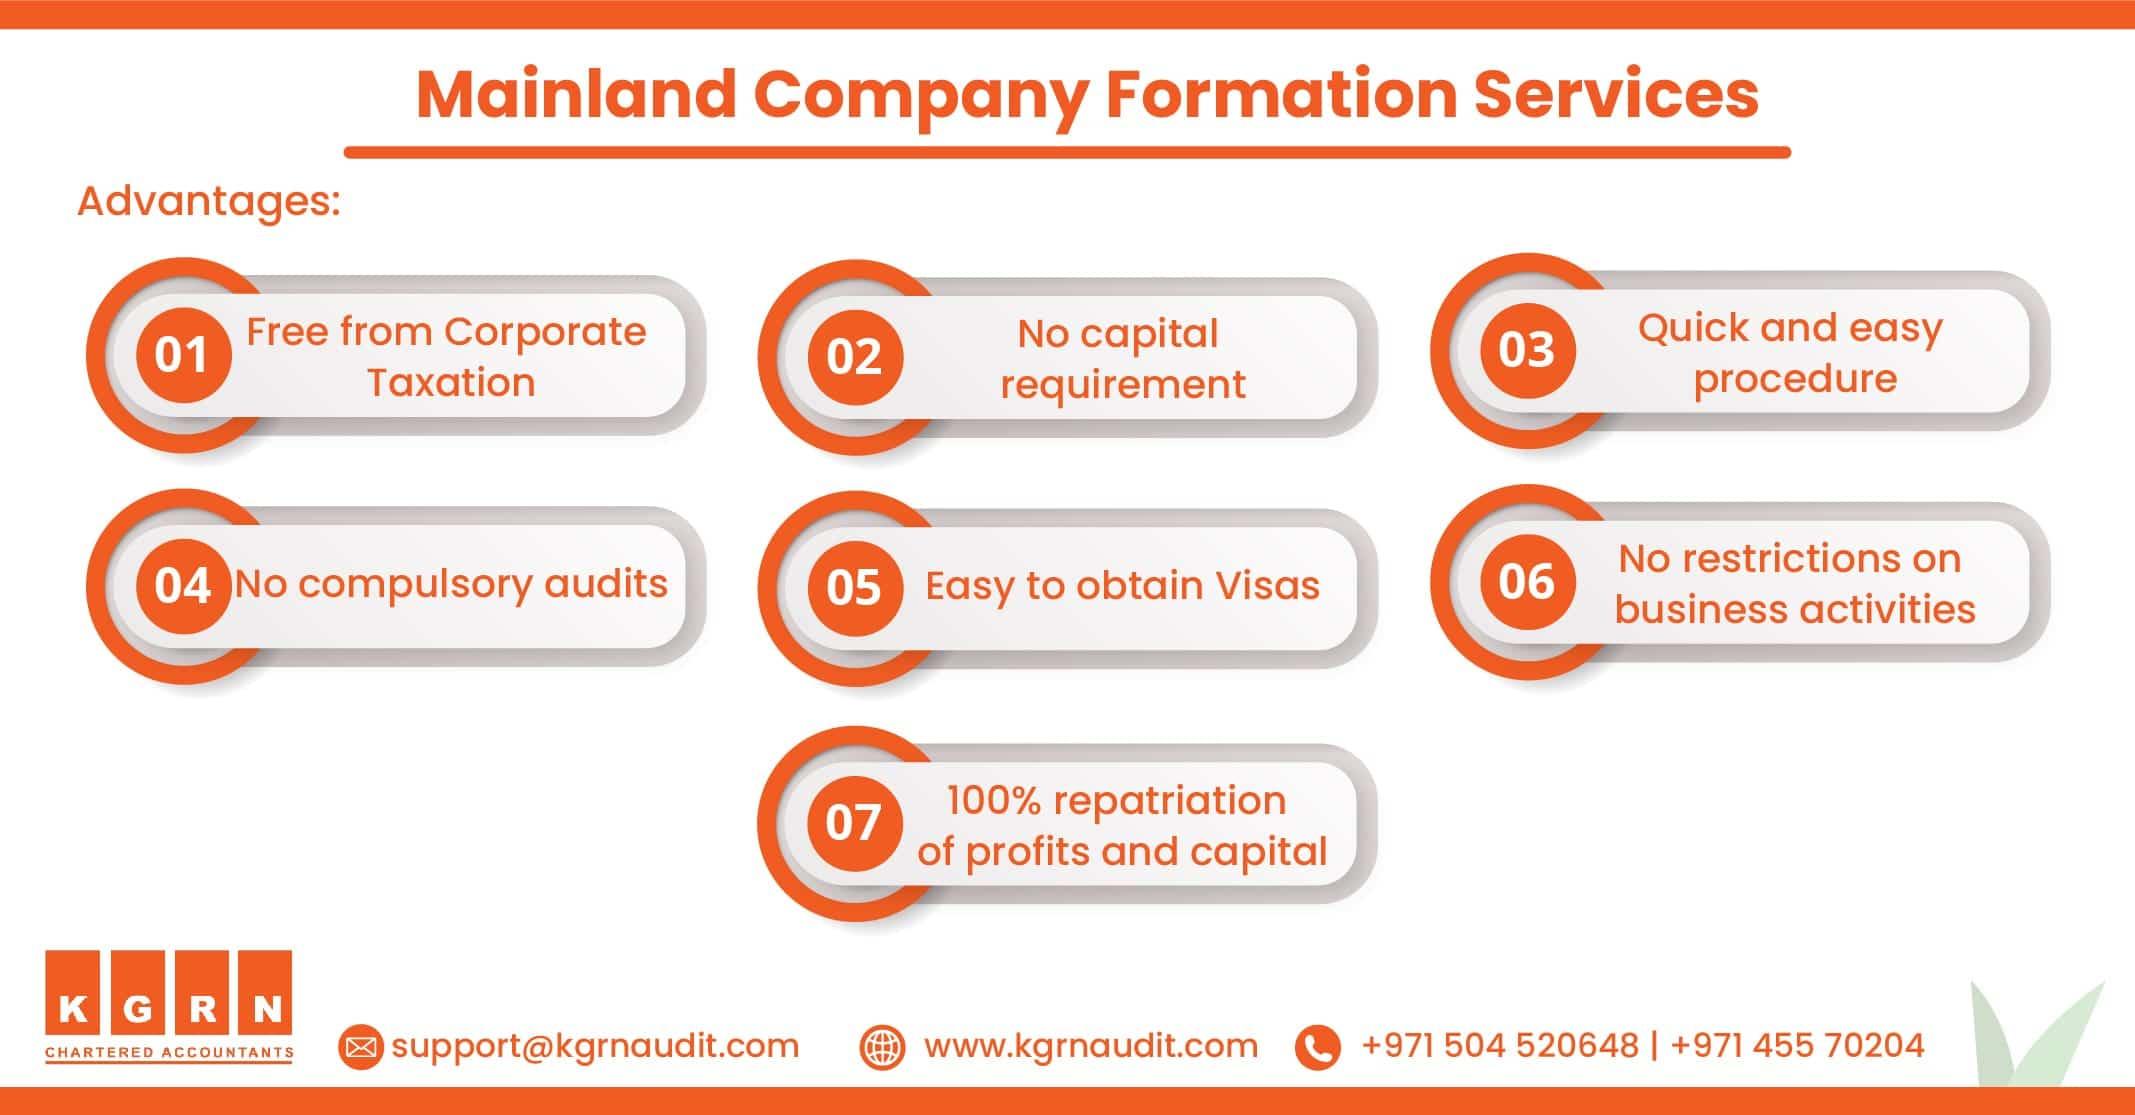 Advantages Mainland Company Formation min